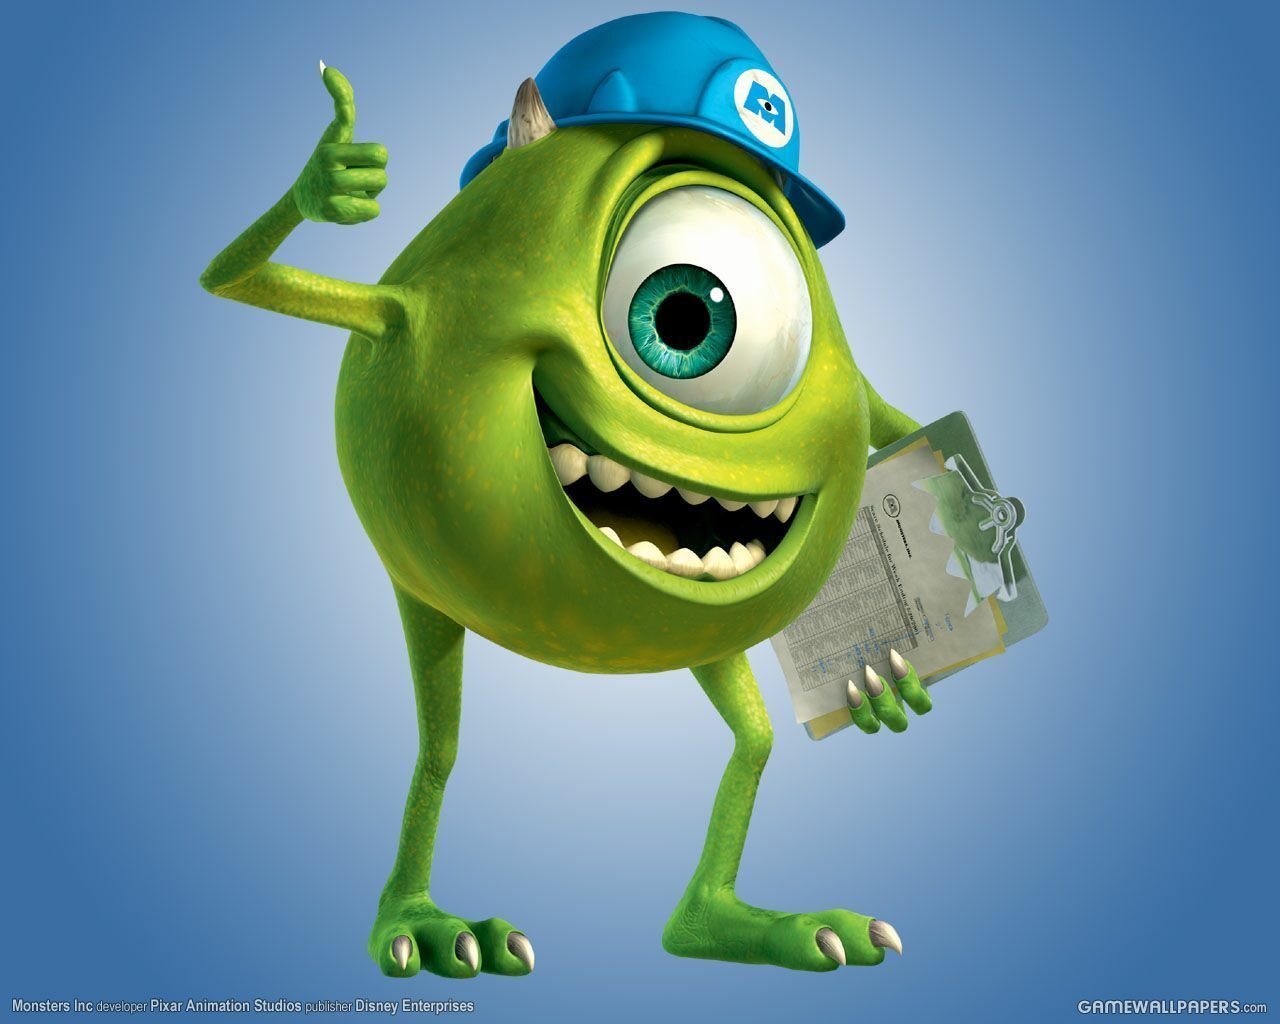 Disney Sidekicks Images Pixar HD Wallpaper And Background Photos